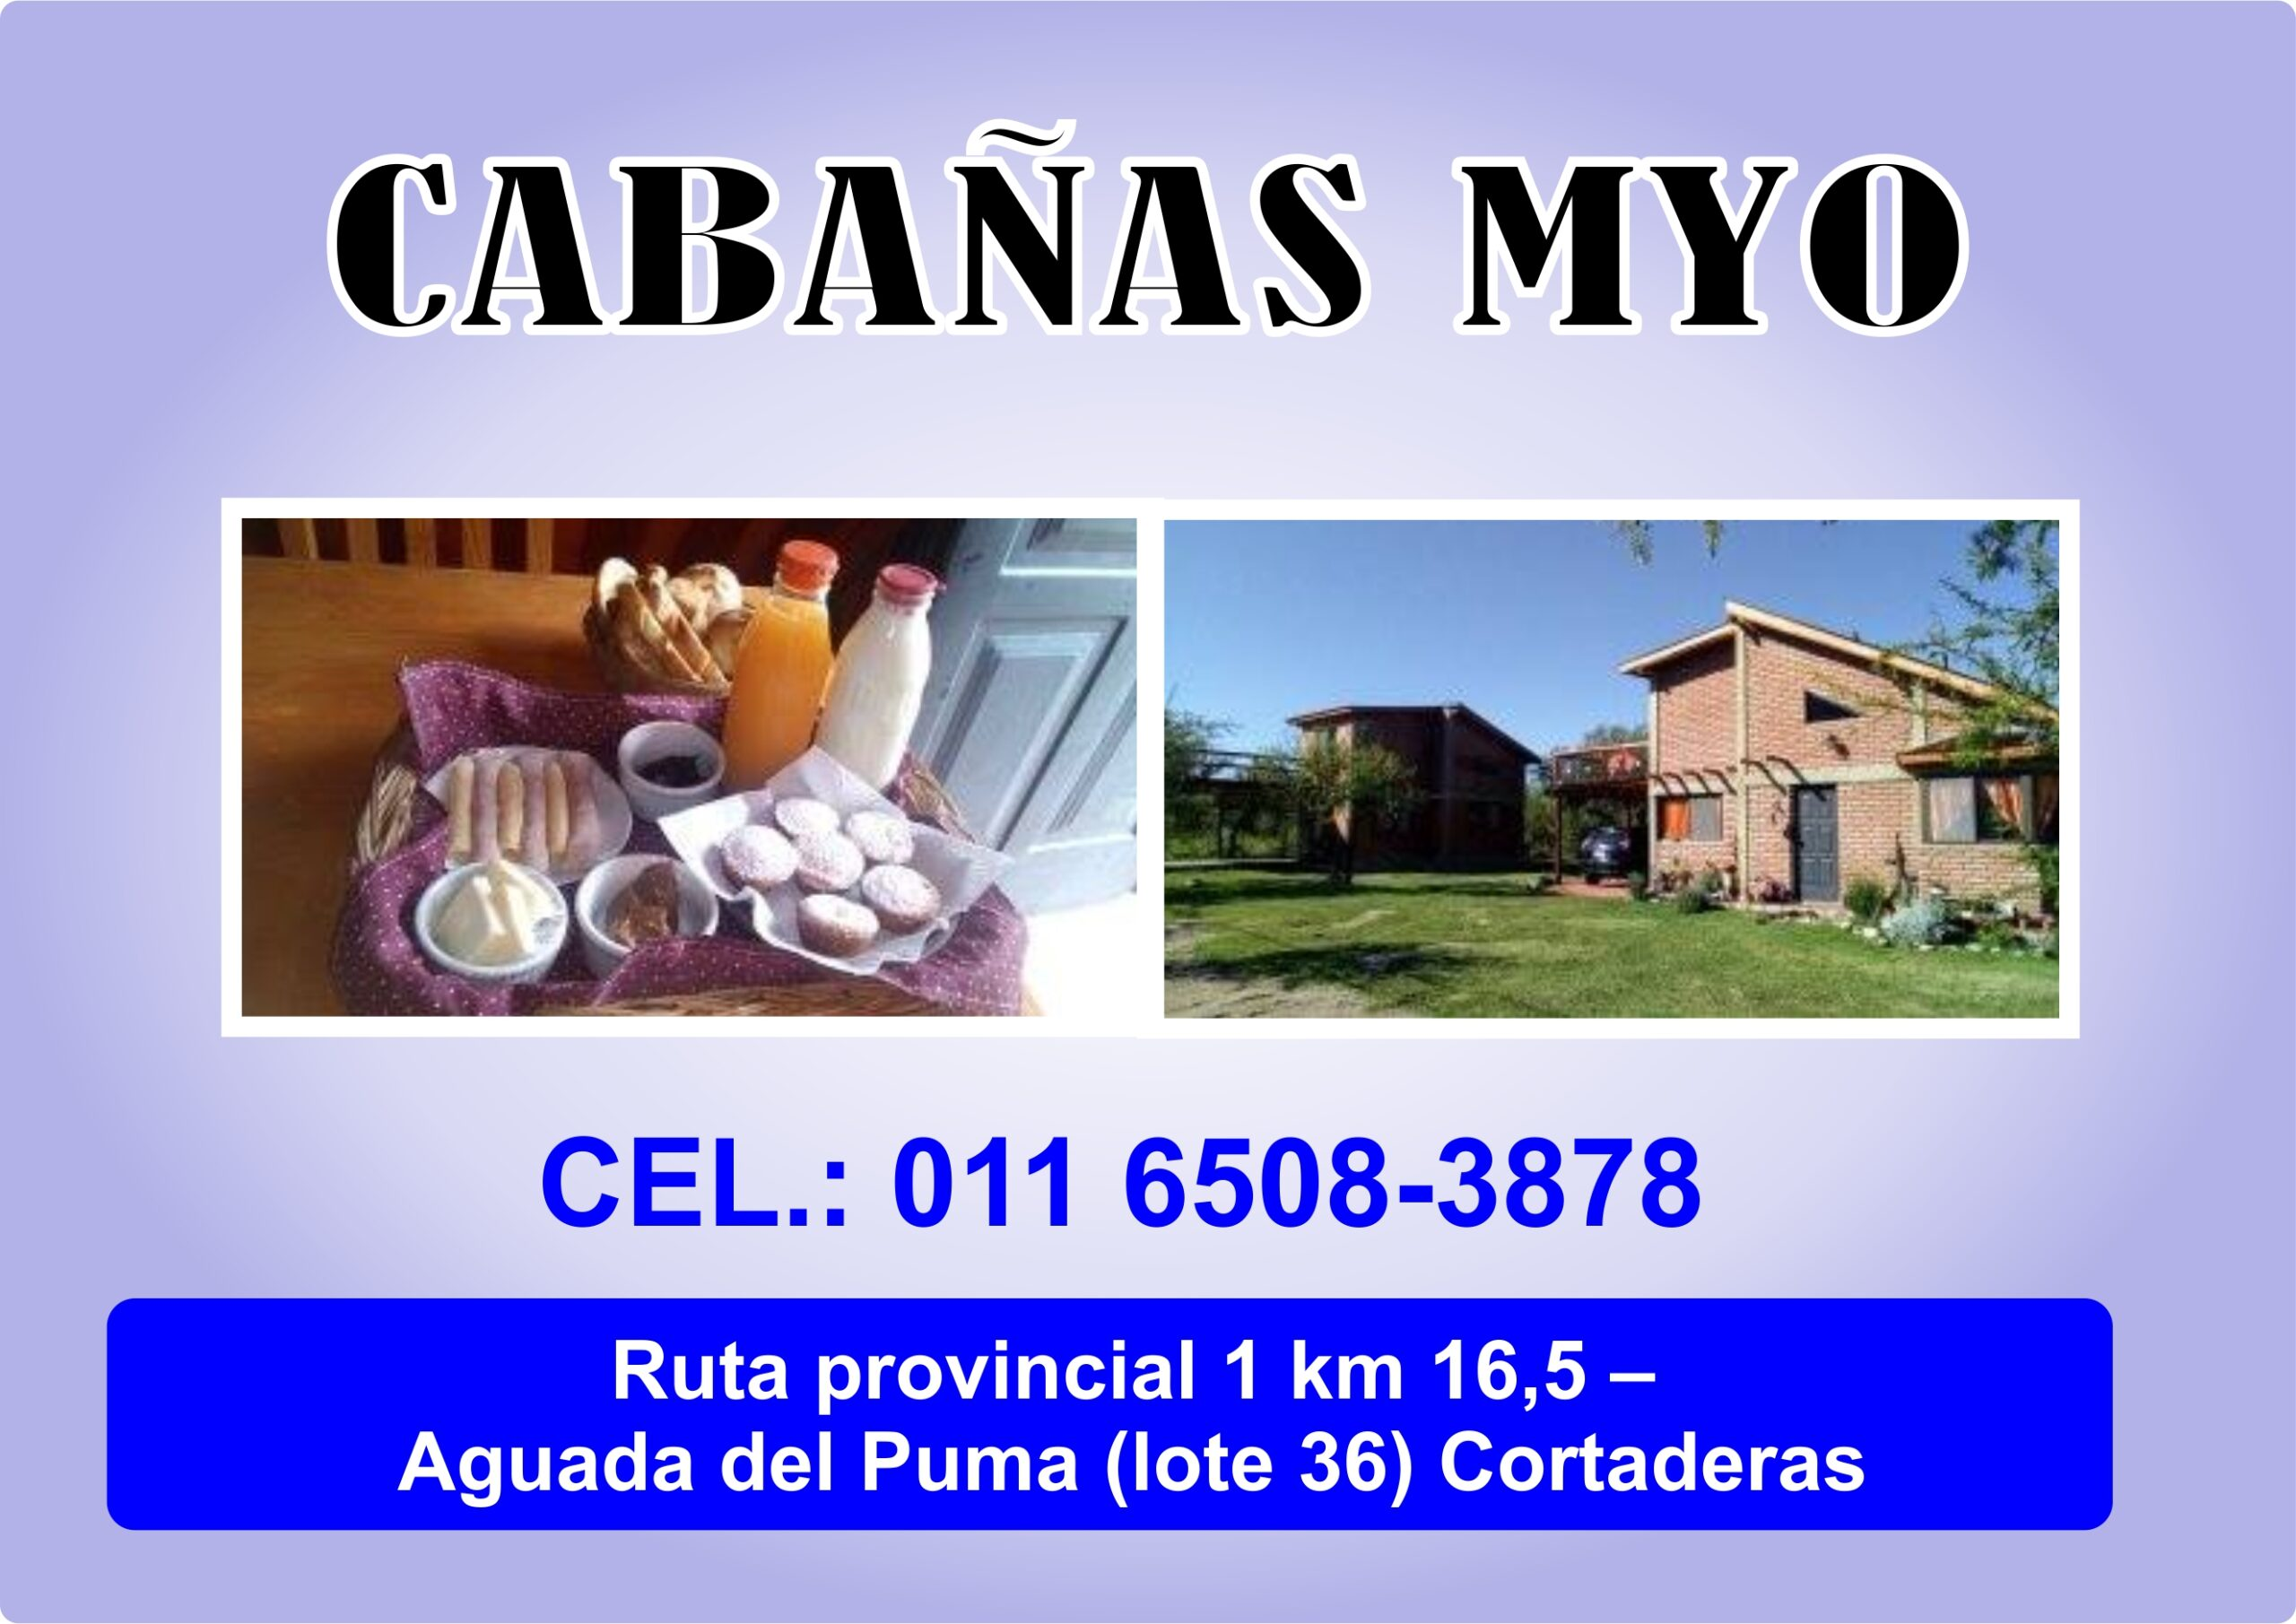 Cabañas MyO